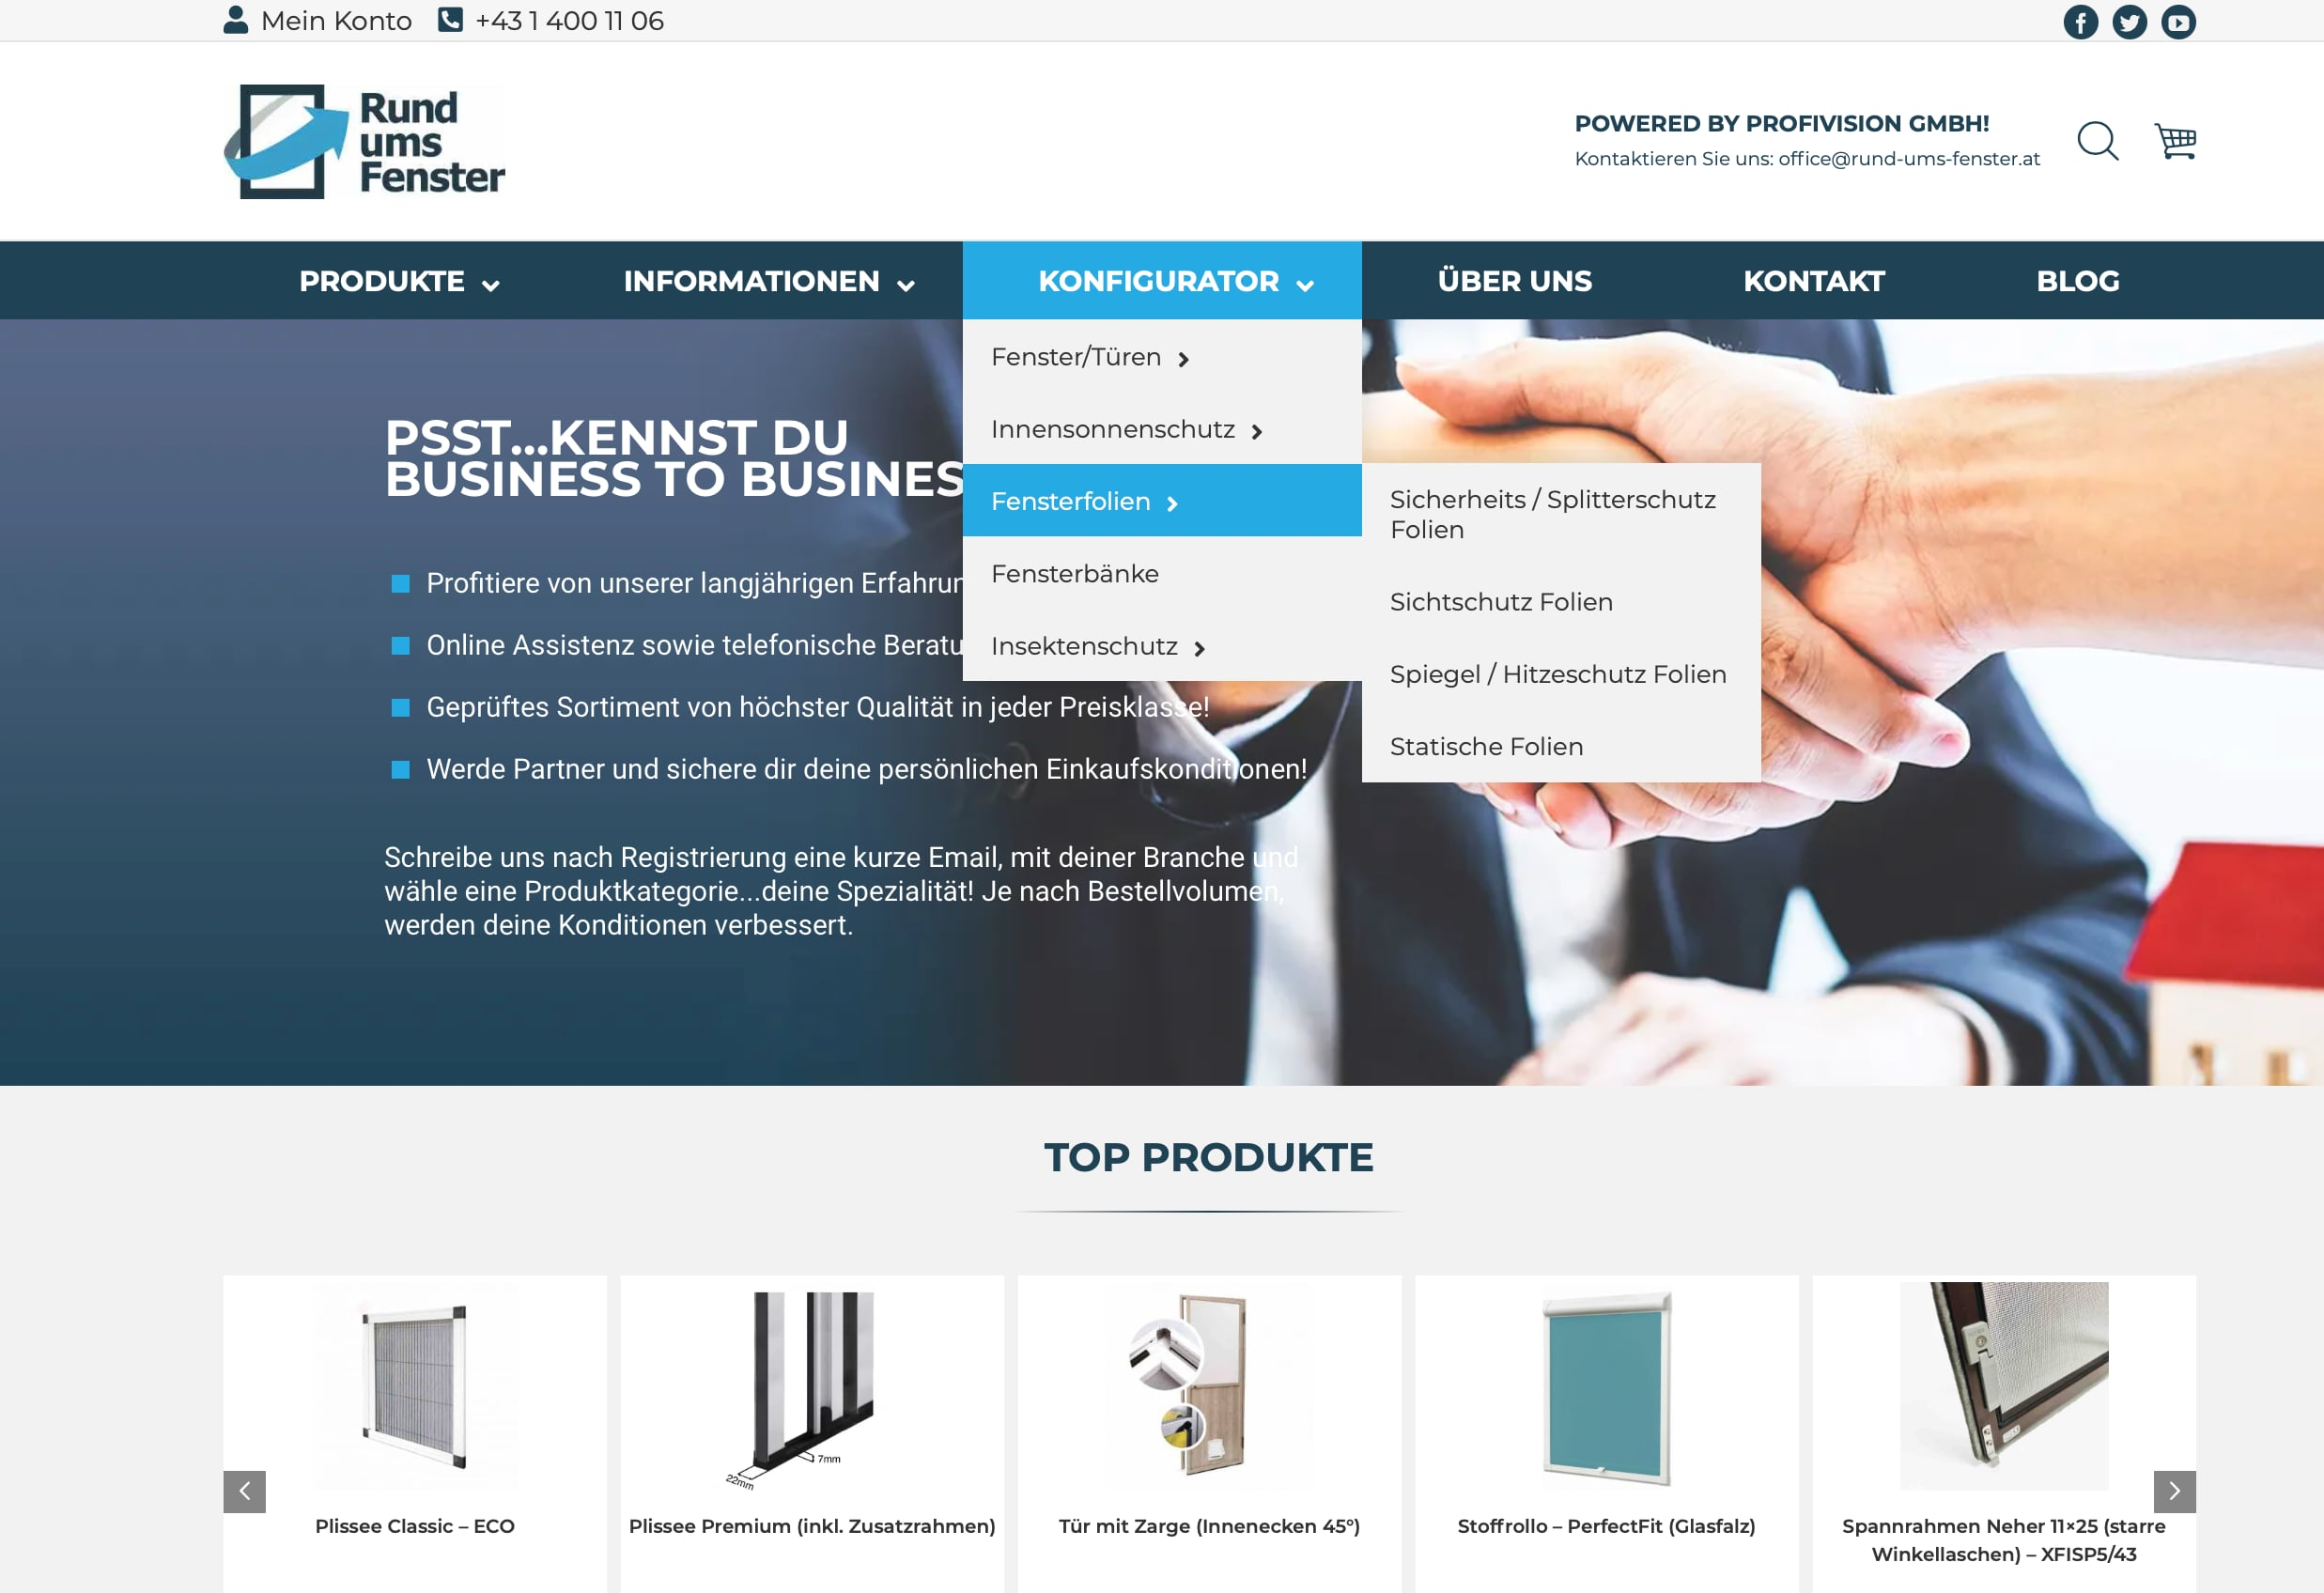 Fensterfolien-Online-Konfigurator-Smart-Asistent